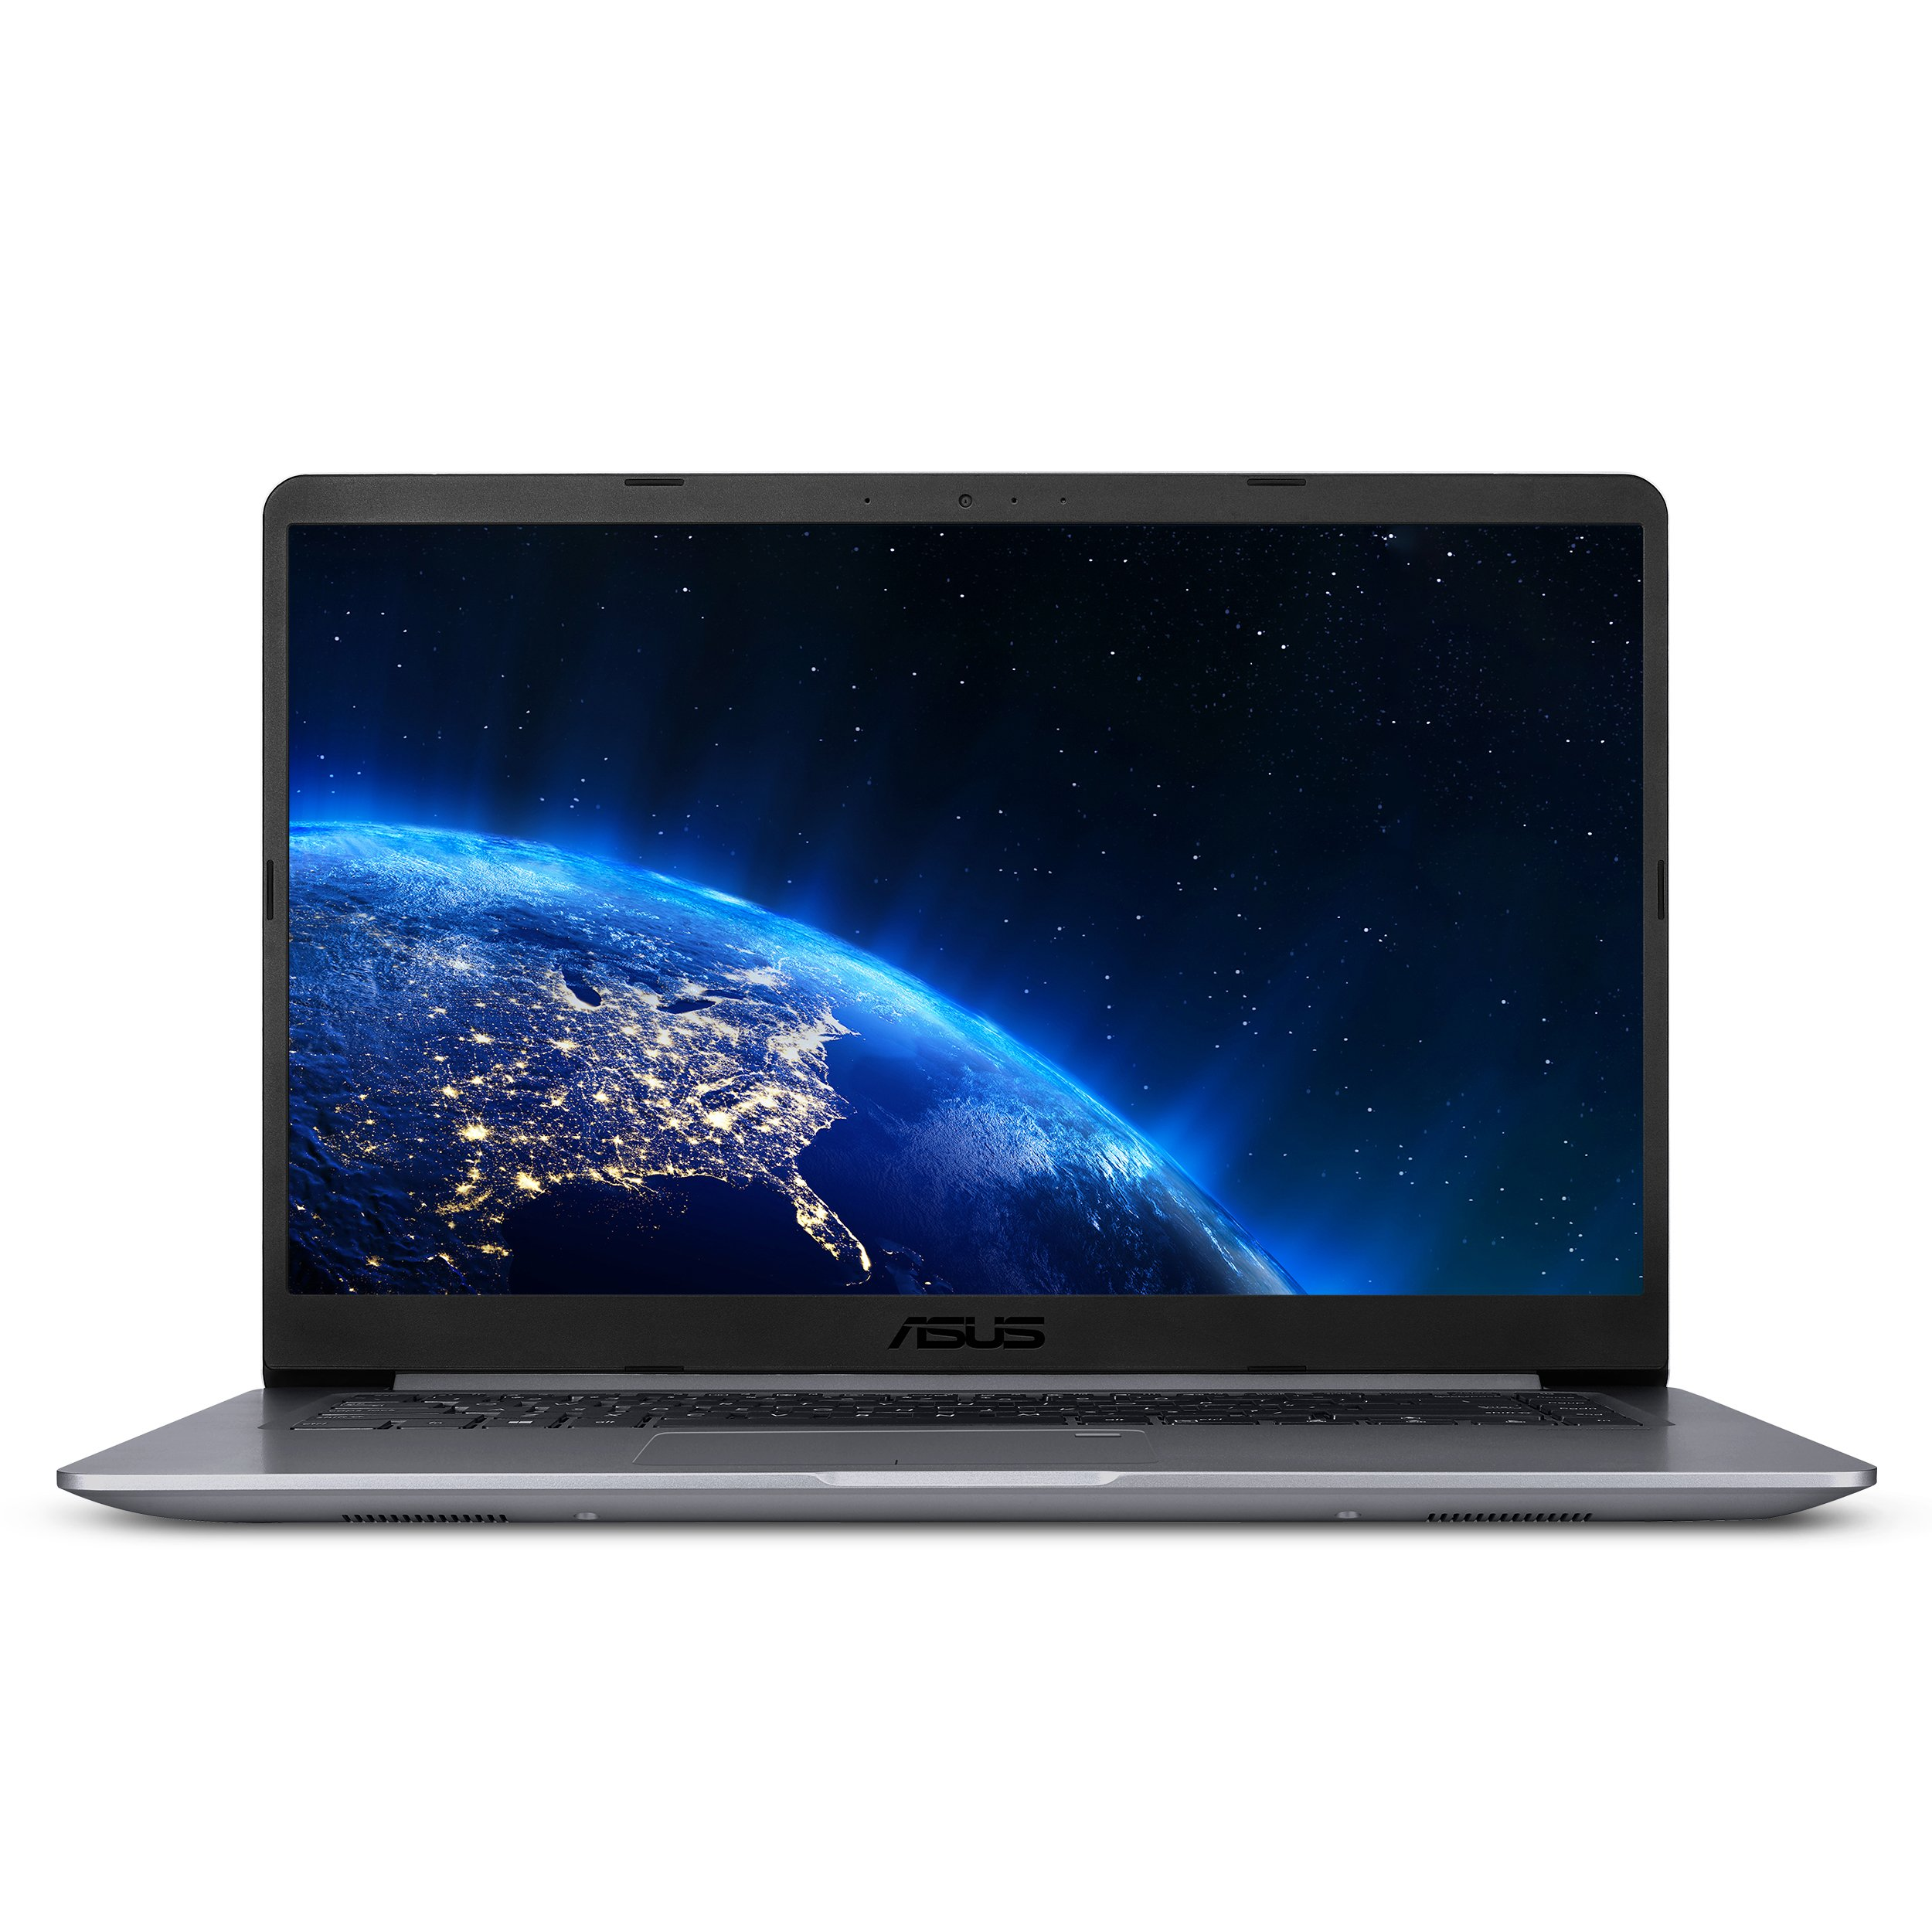 ASUS VivoBook F510UA FHD Laptop, Intel Core i5-8250U, 8GB RAM, 1TB HDD, USB-C, NanoEdge Display, Fingerprint, Windows 10, Star Gray (F510UA-AH51) by Asus